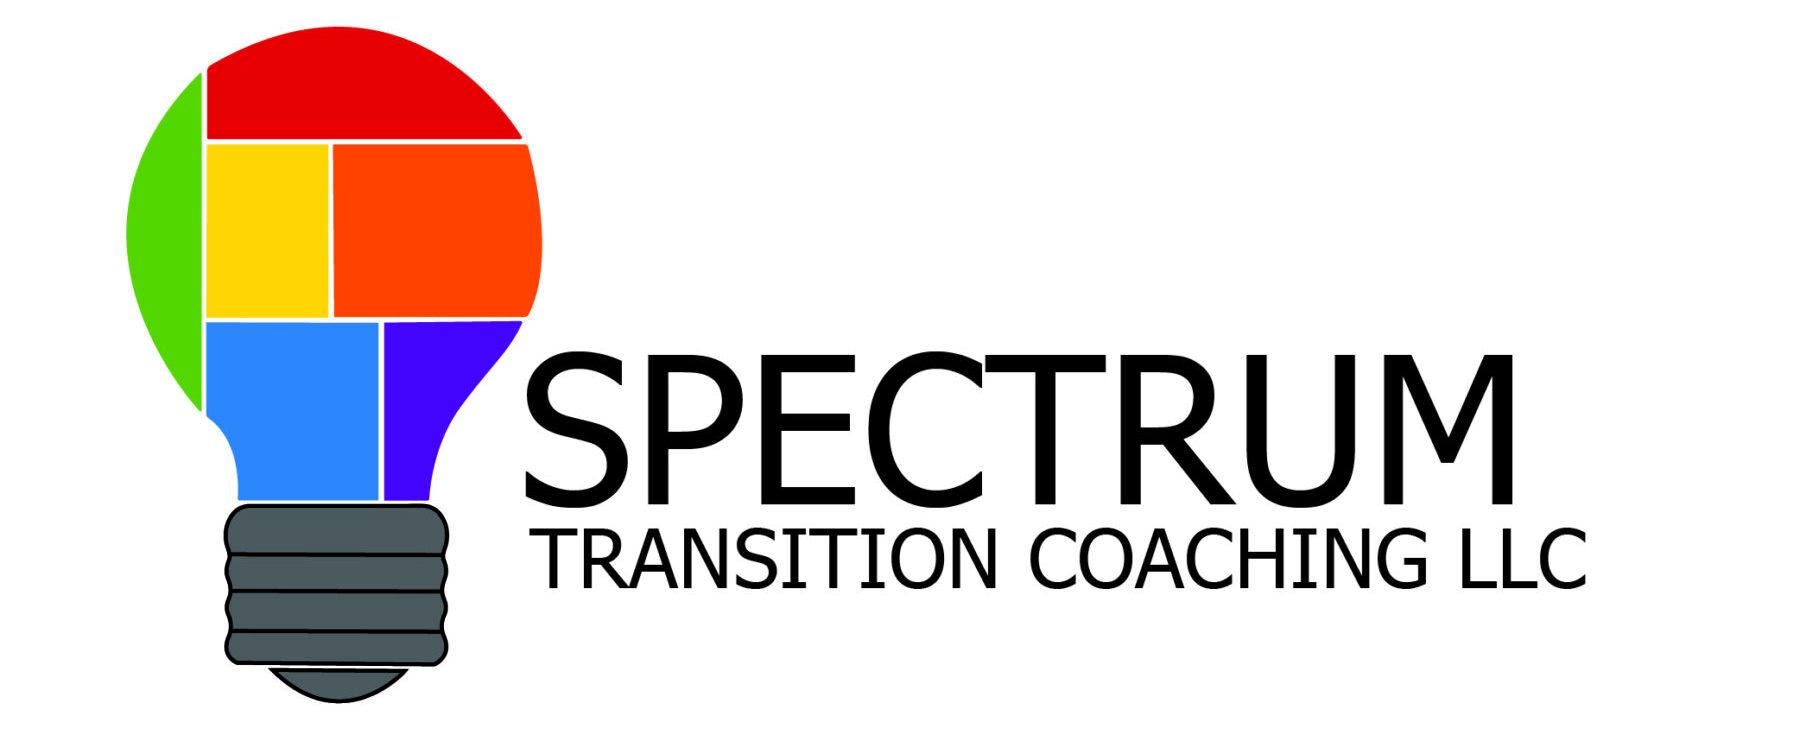 Spectrum Transition Coaching, LLC